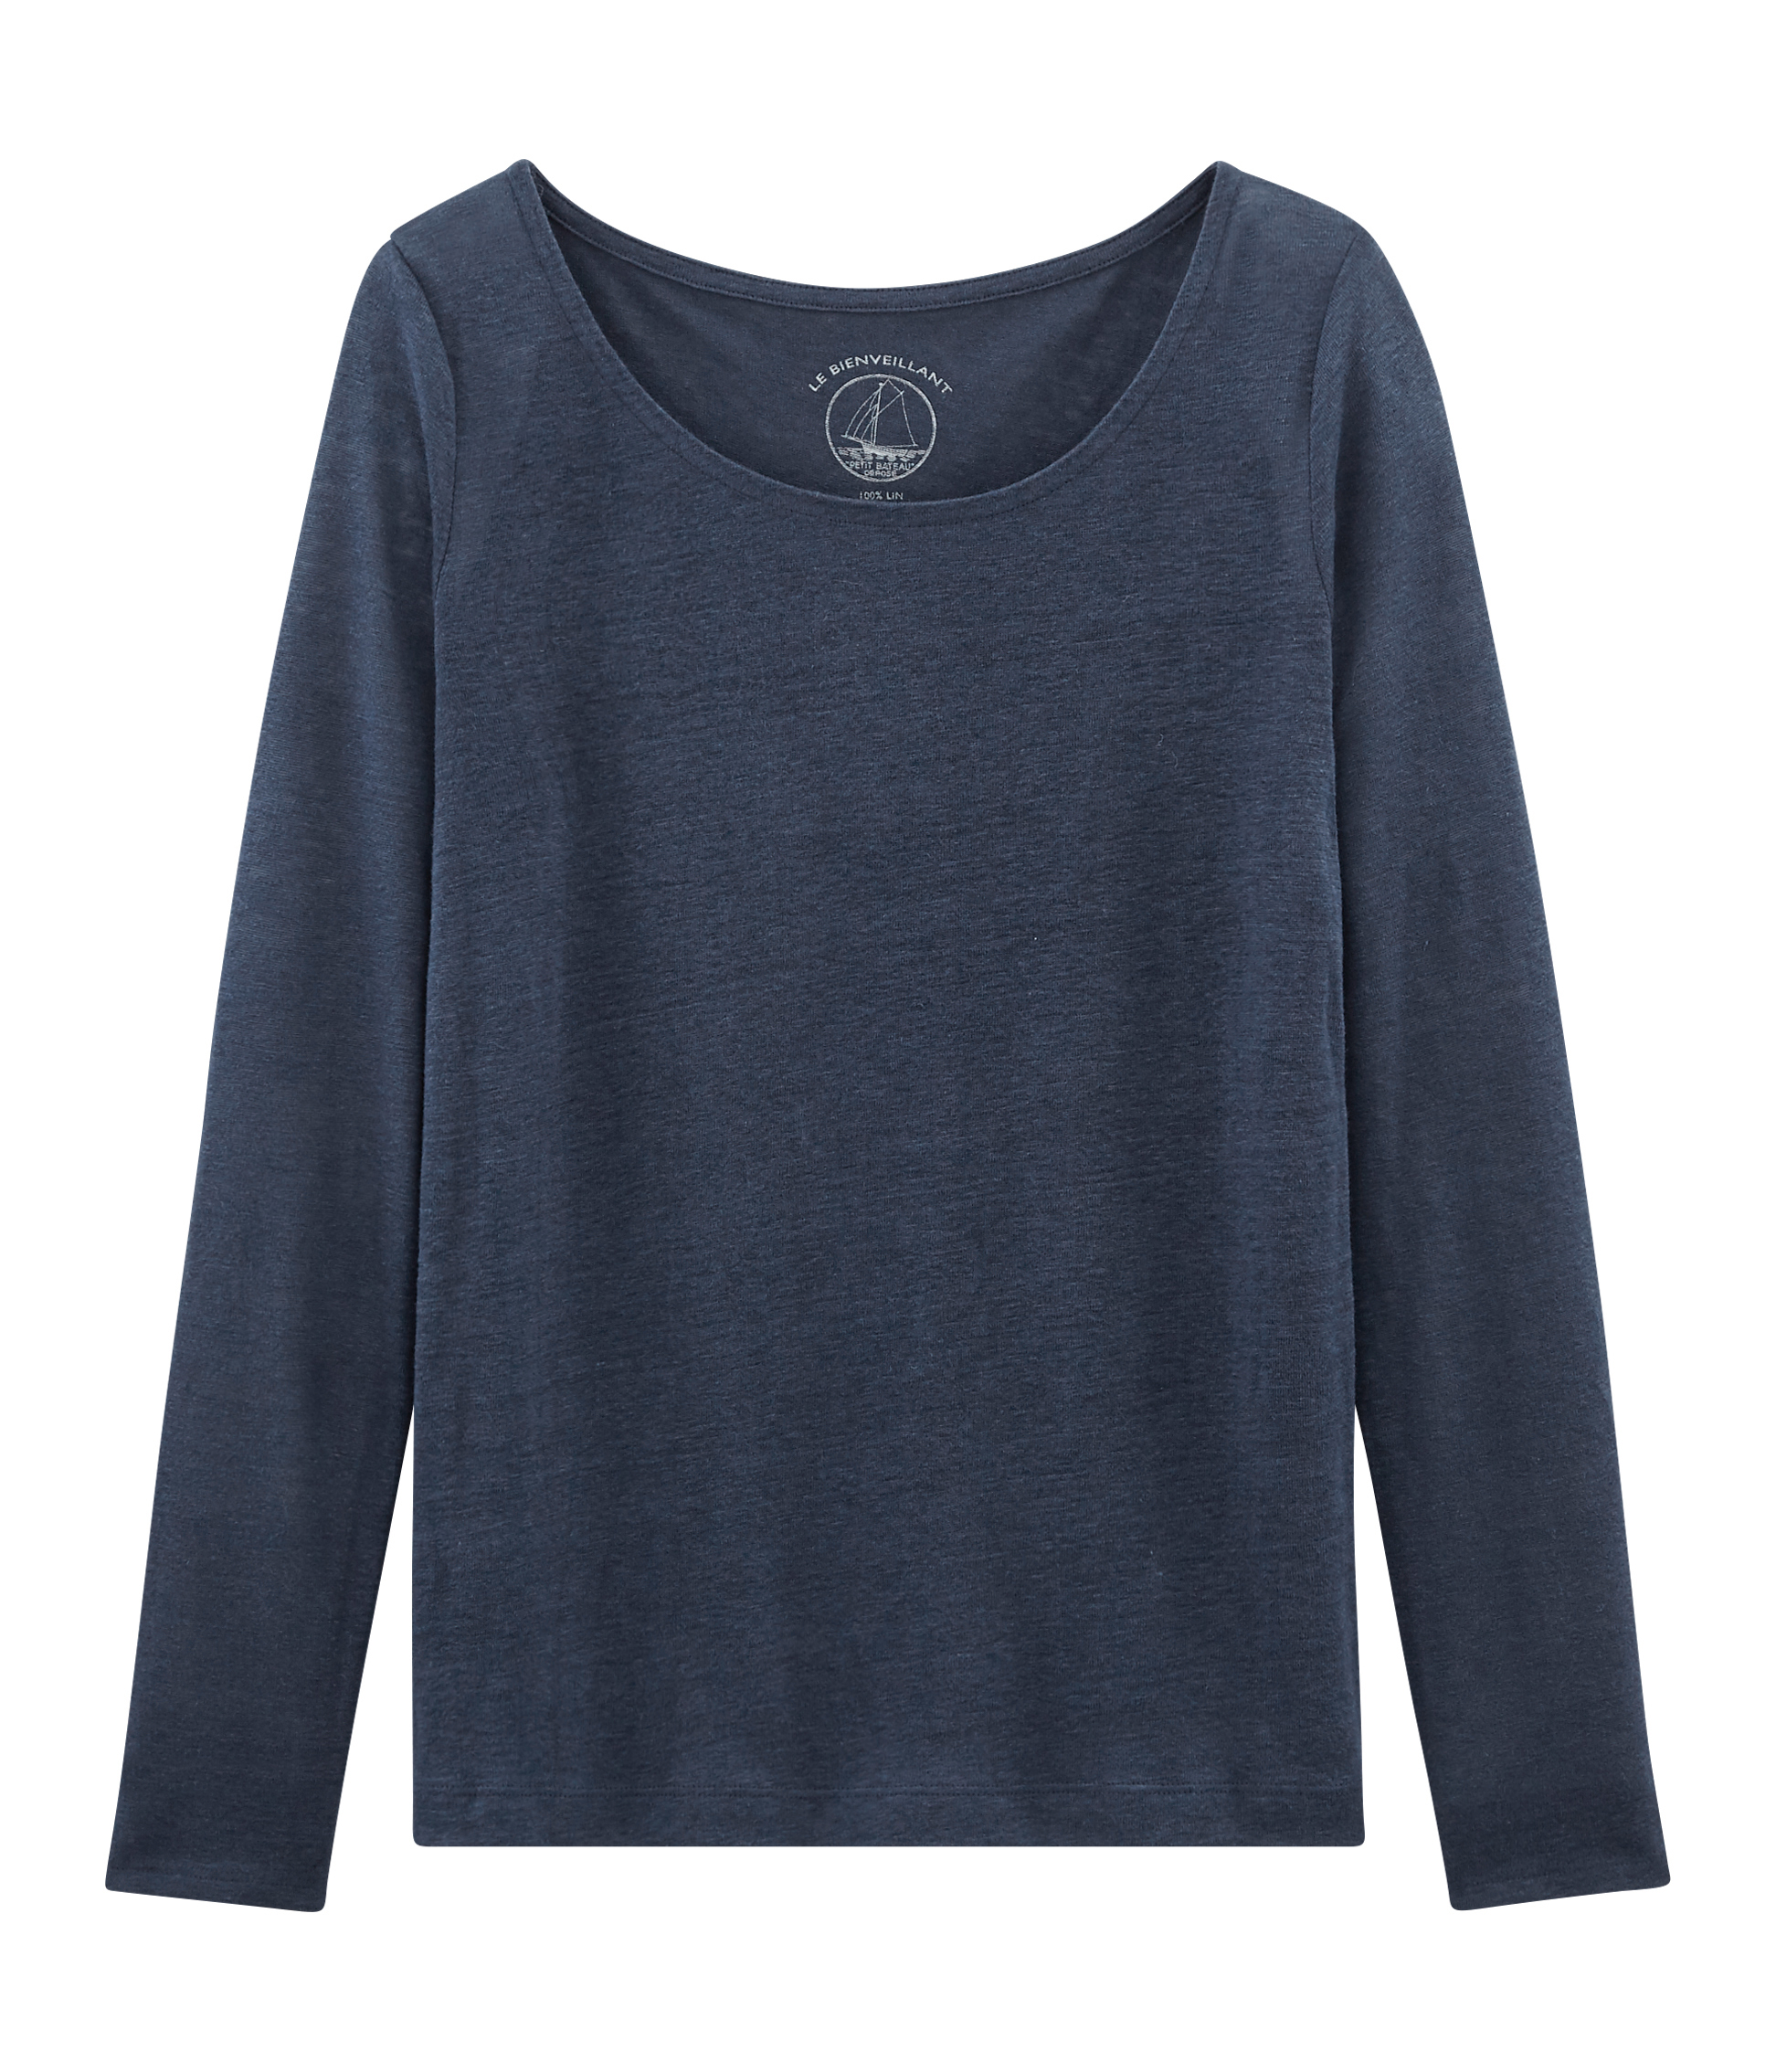 c896fa65a2 Tee-shirt manches longues femme en lin | Petit Bateau